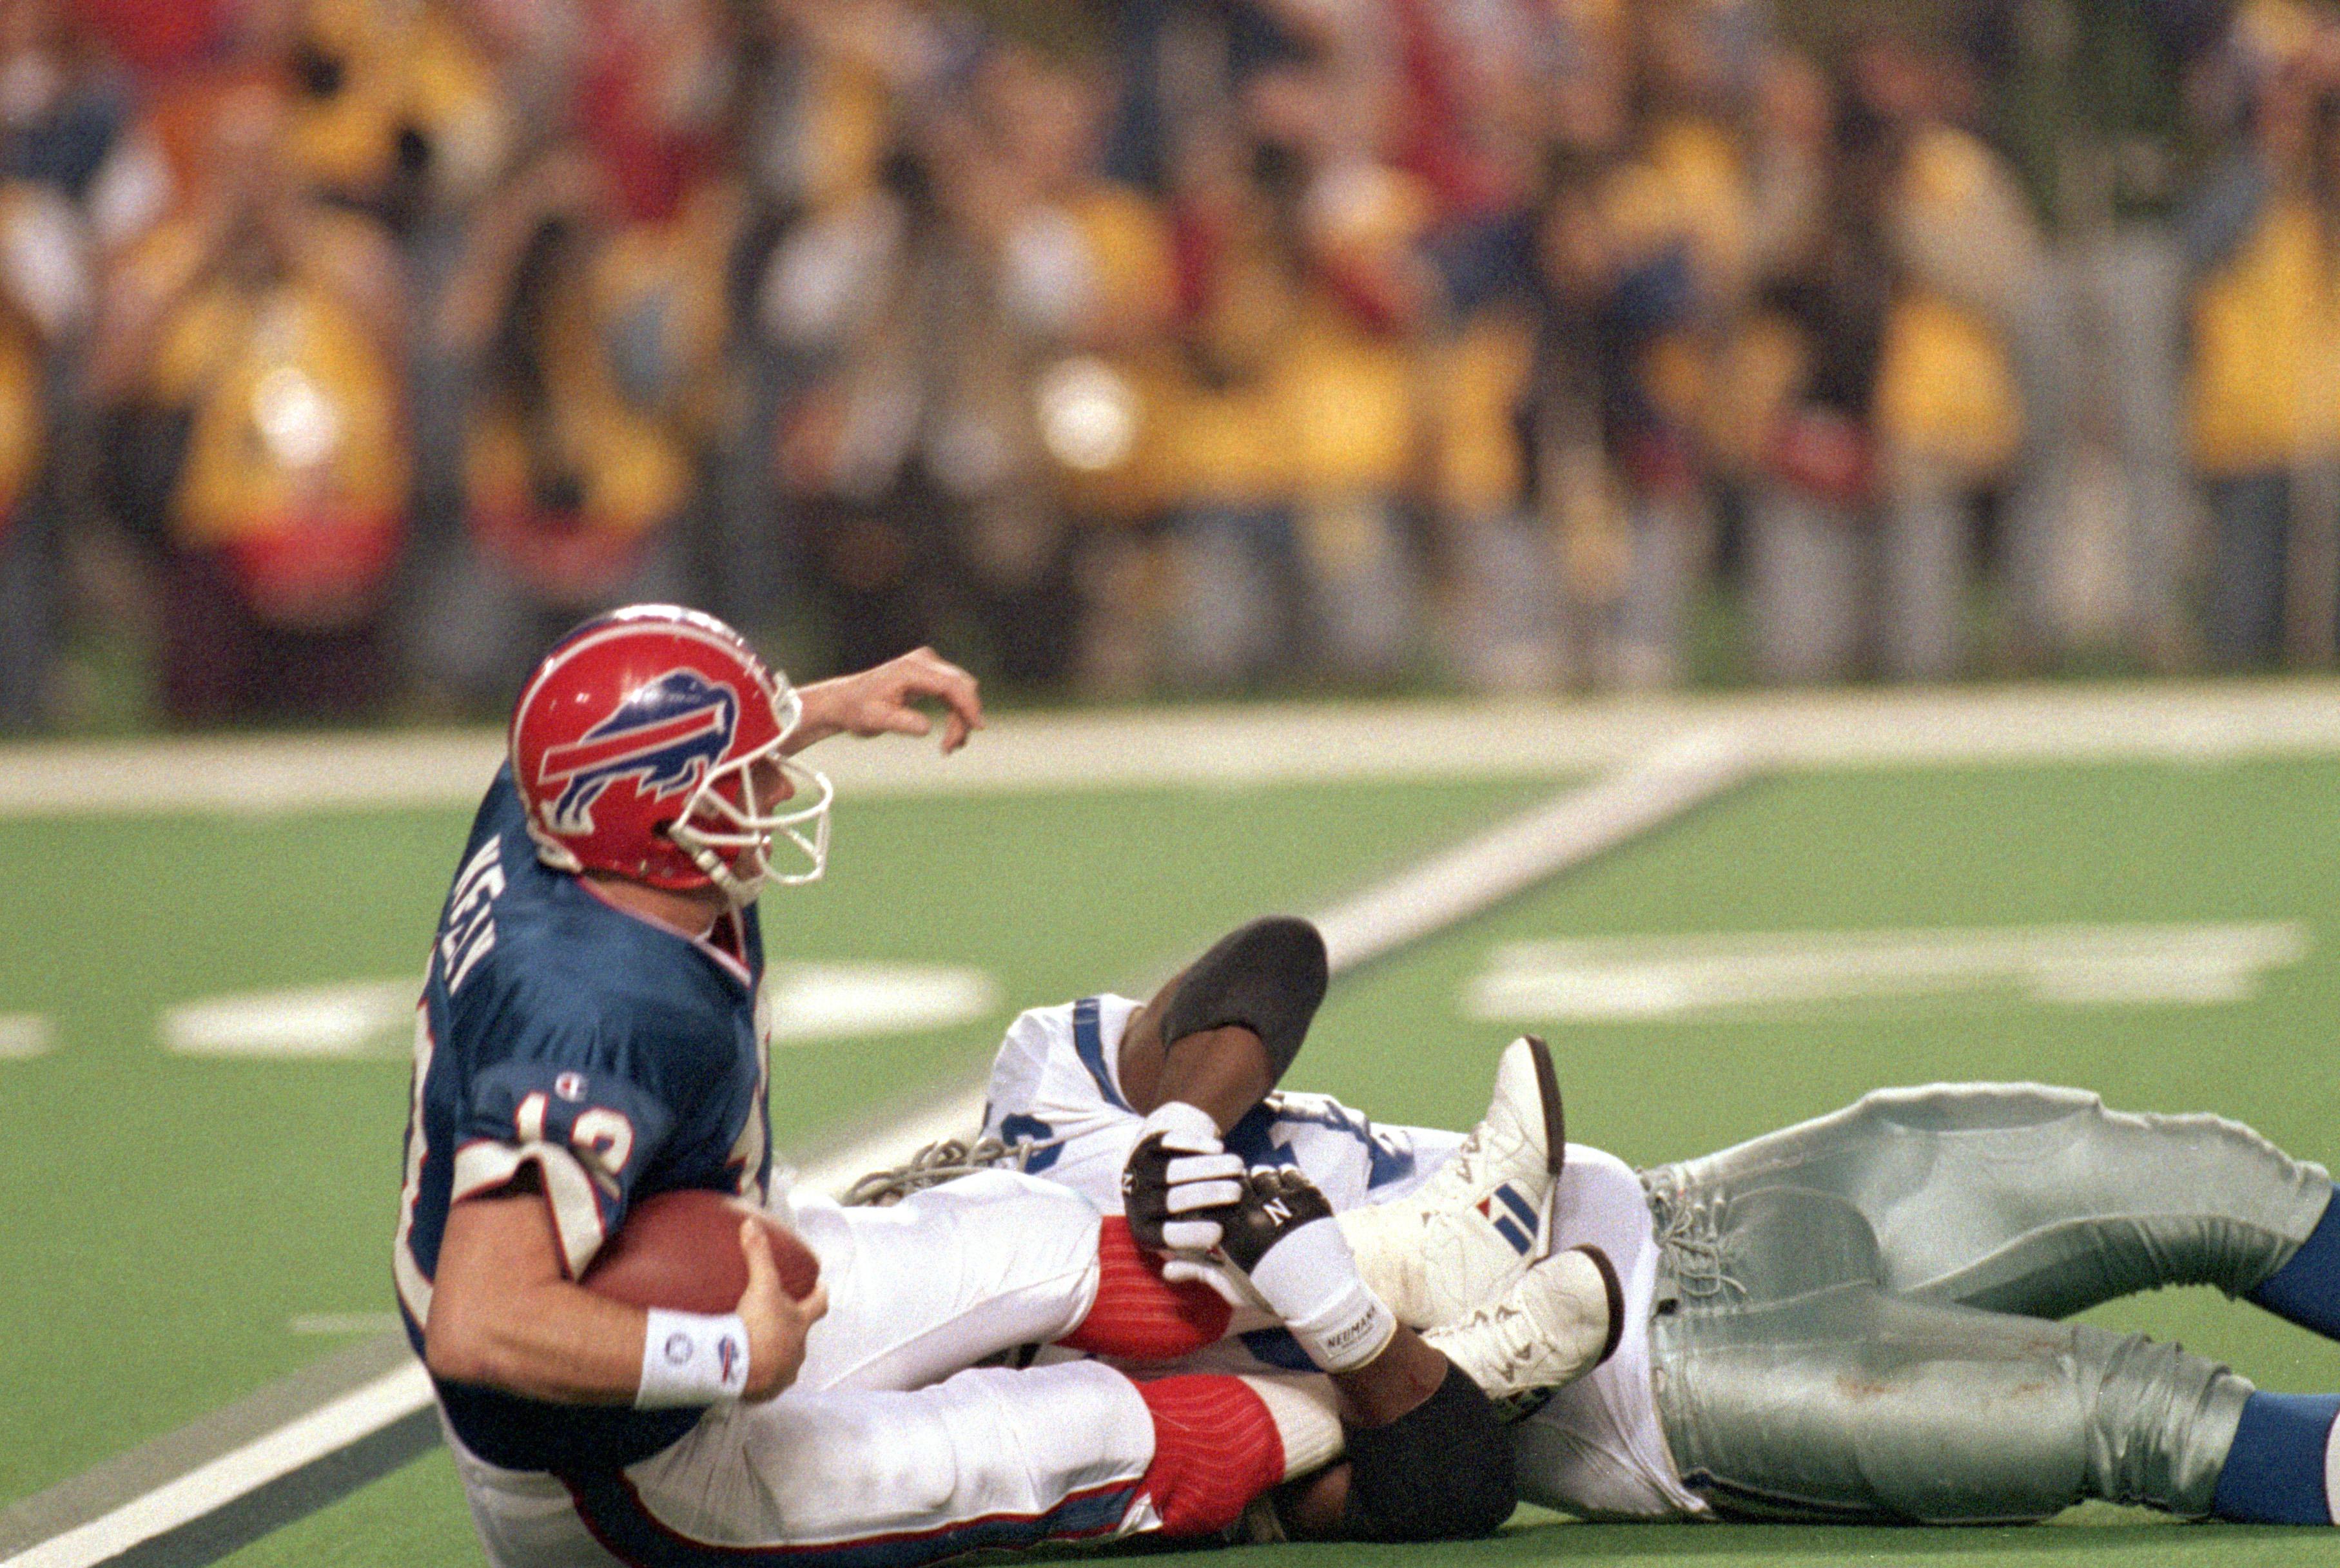 ATLANTA  - JANUARY 30:  Defensive tackle Jimmie Jones #97 of the Dallas Cowboys sacks quarterback Jim Kelly #12 of the Buffalo Bills during Super Bowl XXVIII against the Dallas Cowboys at the Georgia Dome on January 30, 1994 in Atlanta, Georgia.  Kelly co